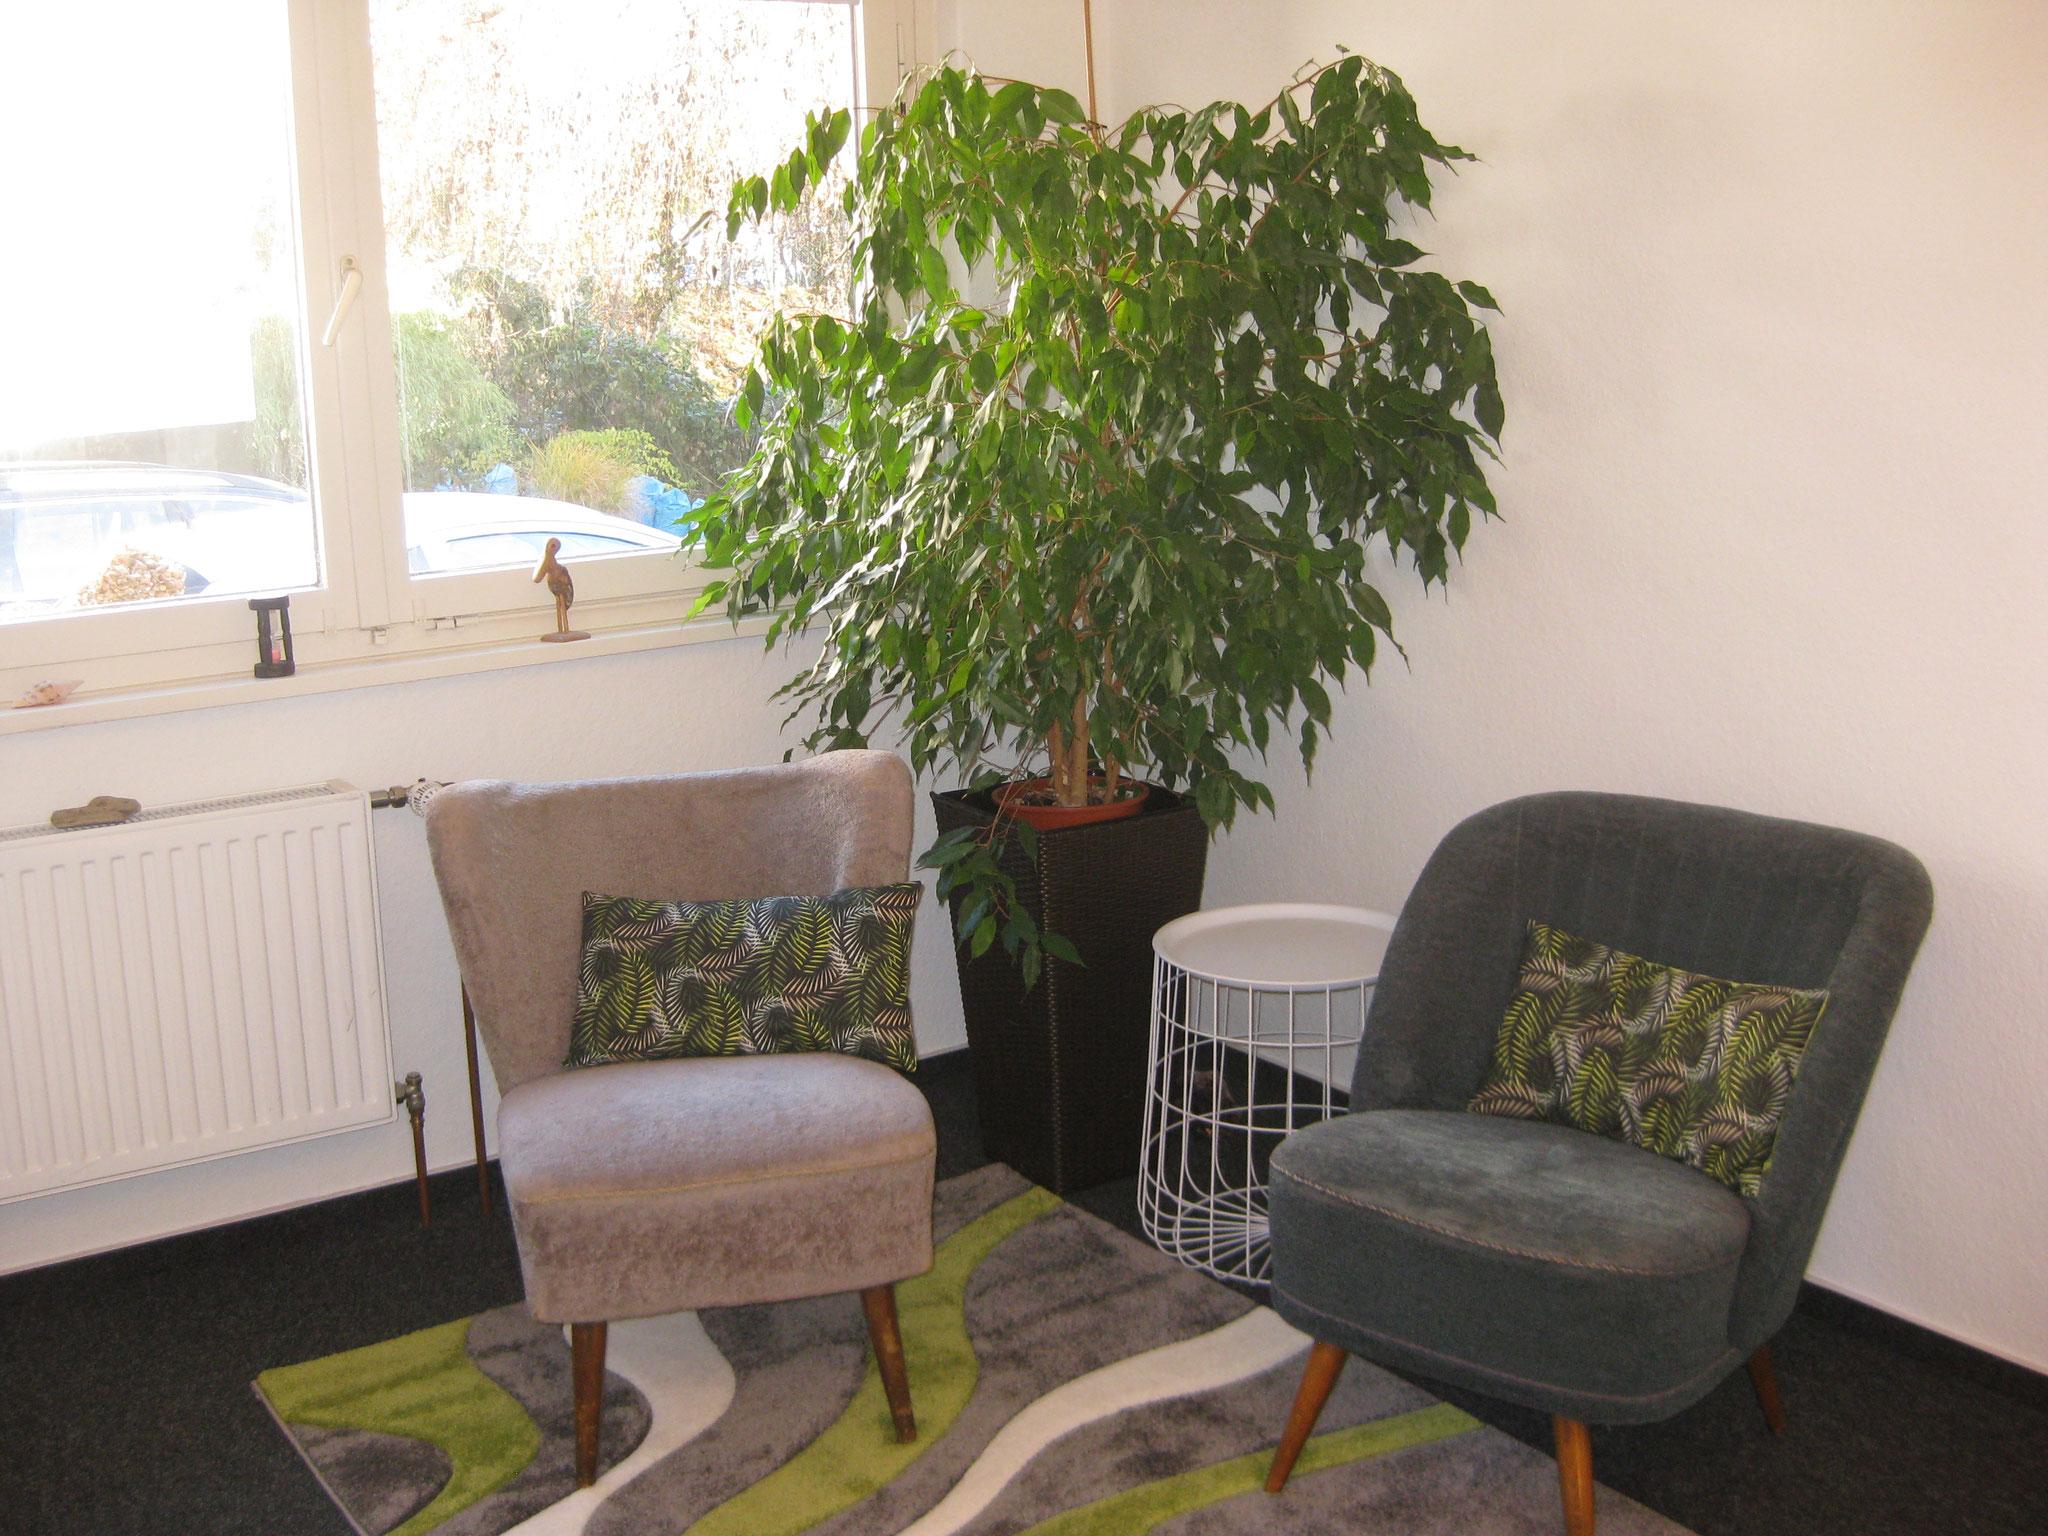 Praxisraum in der Wilmerdingstraße 9B